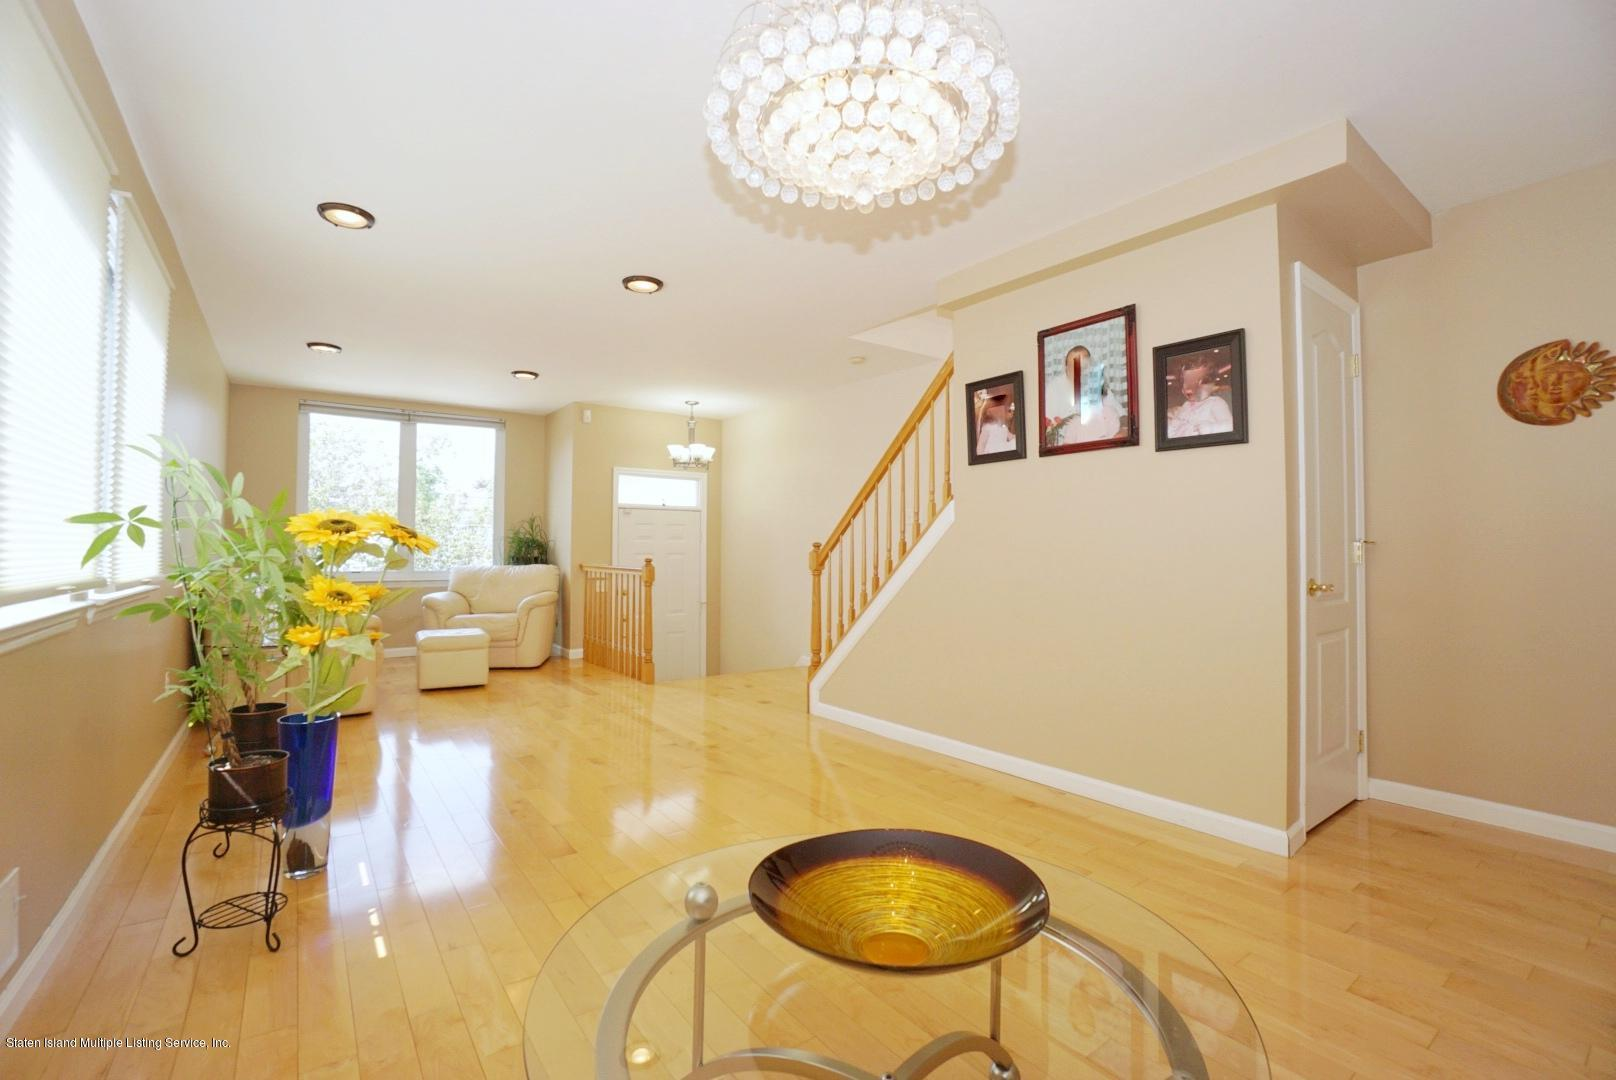 Single Family - Semi-Attached 18 Dunhill Lane  Staten Island, NY 10309, MLS-1139055-6